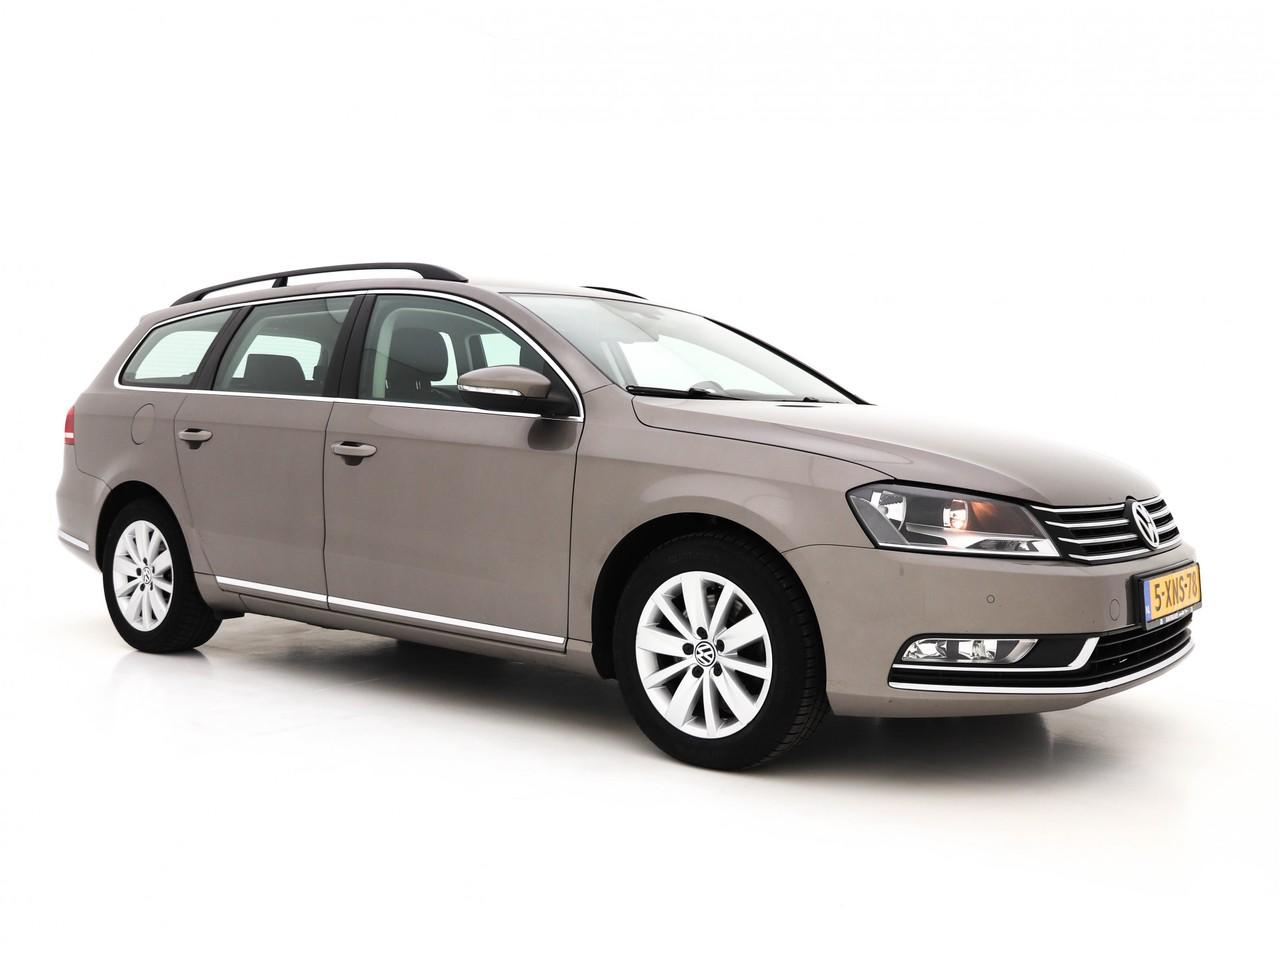 Volkswagen Passat Variant 1.6 tdi highline bluemotion *pdc+ecc+cruise*